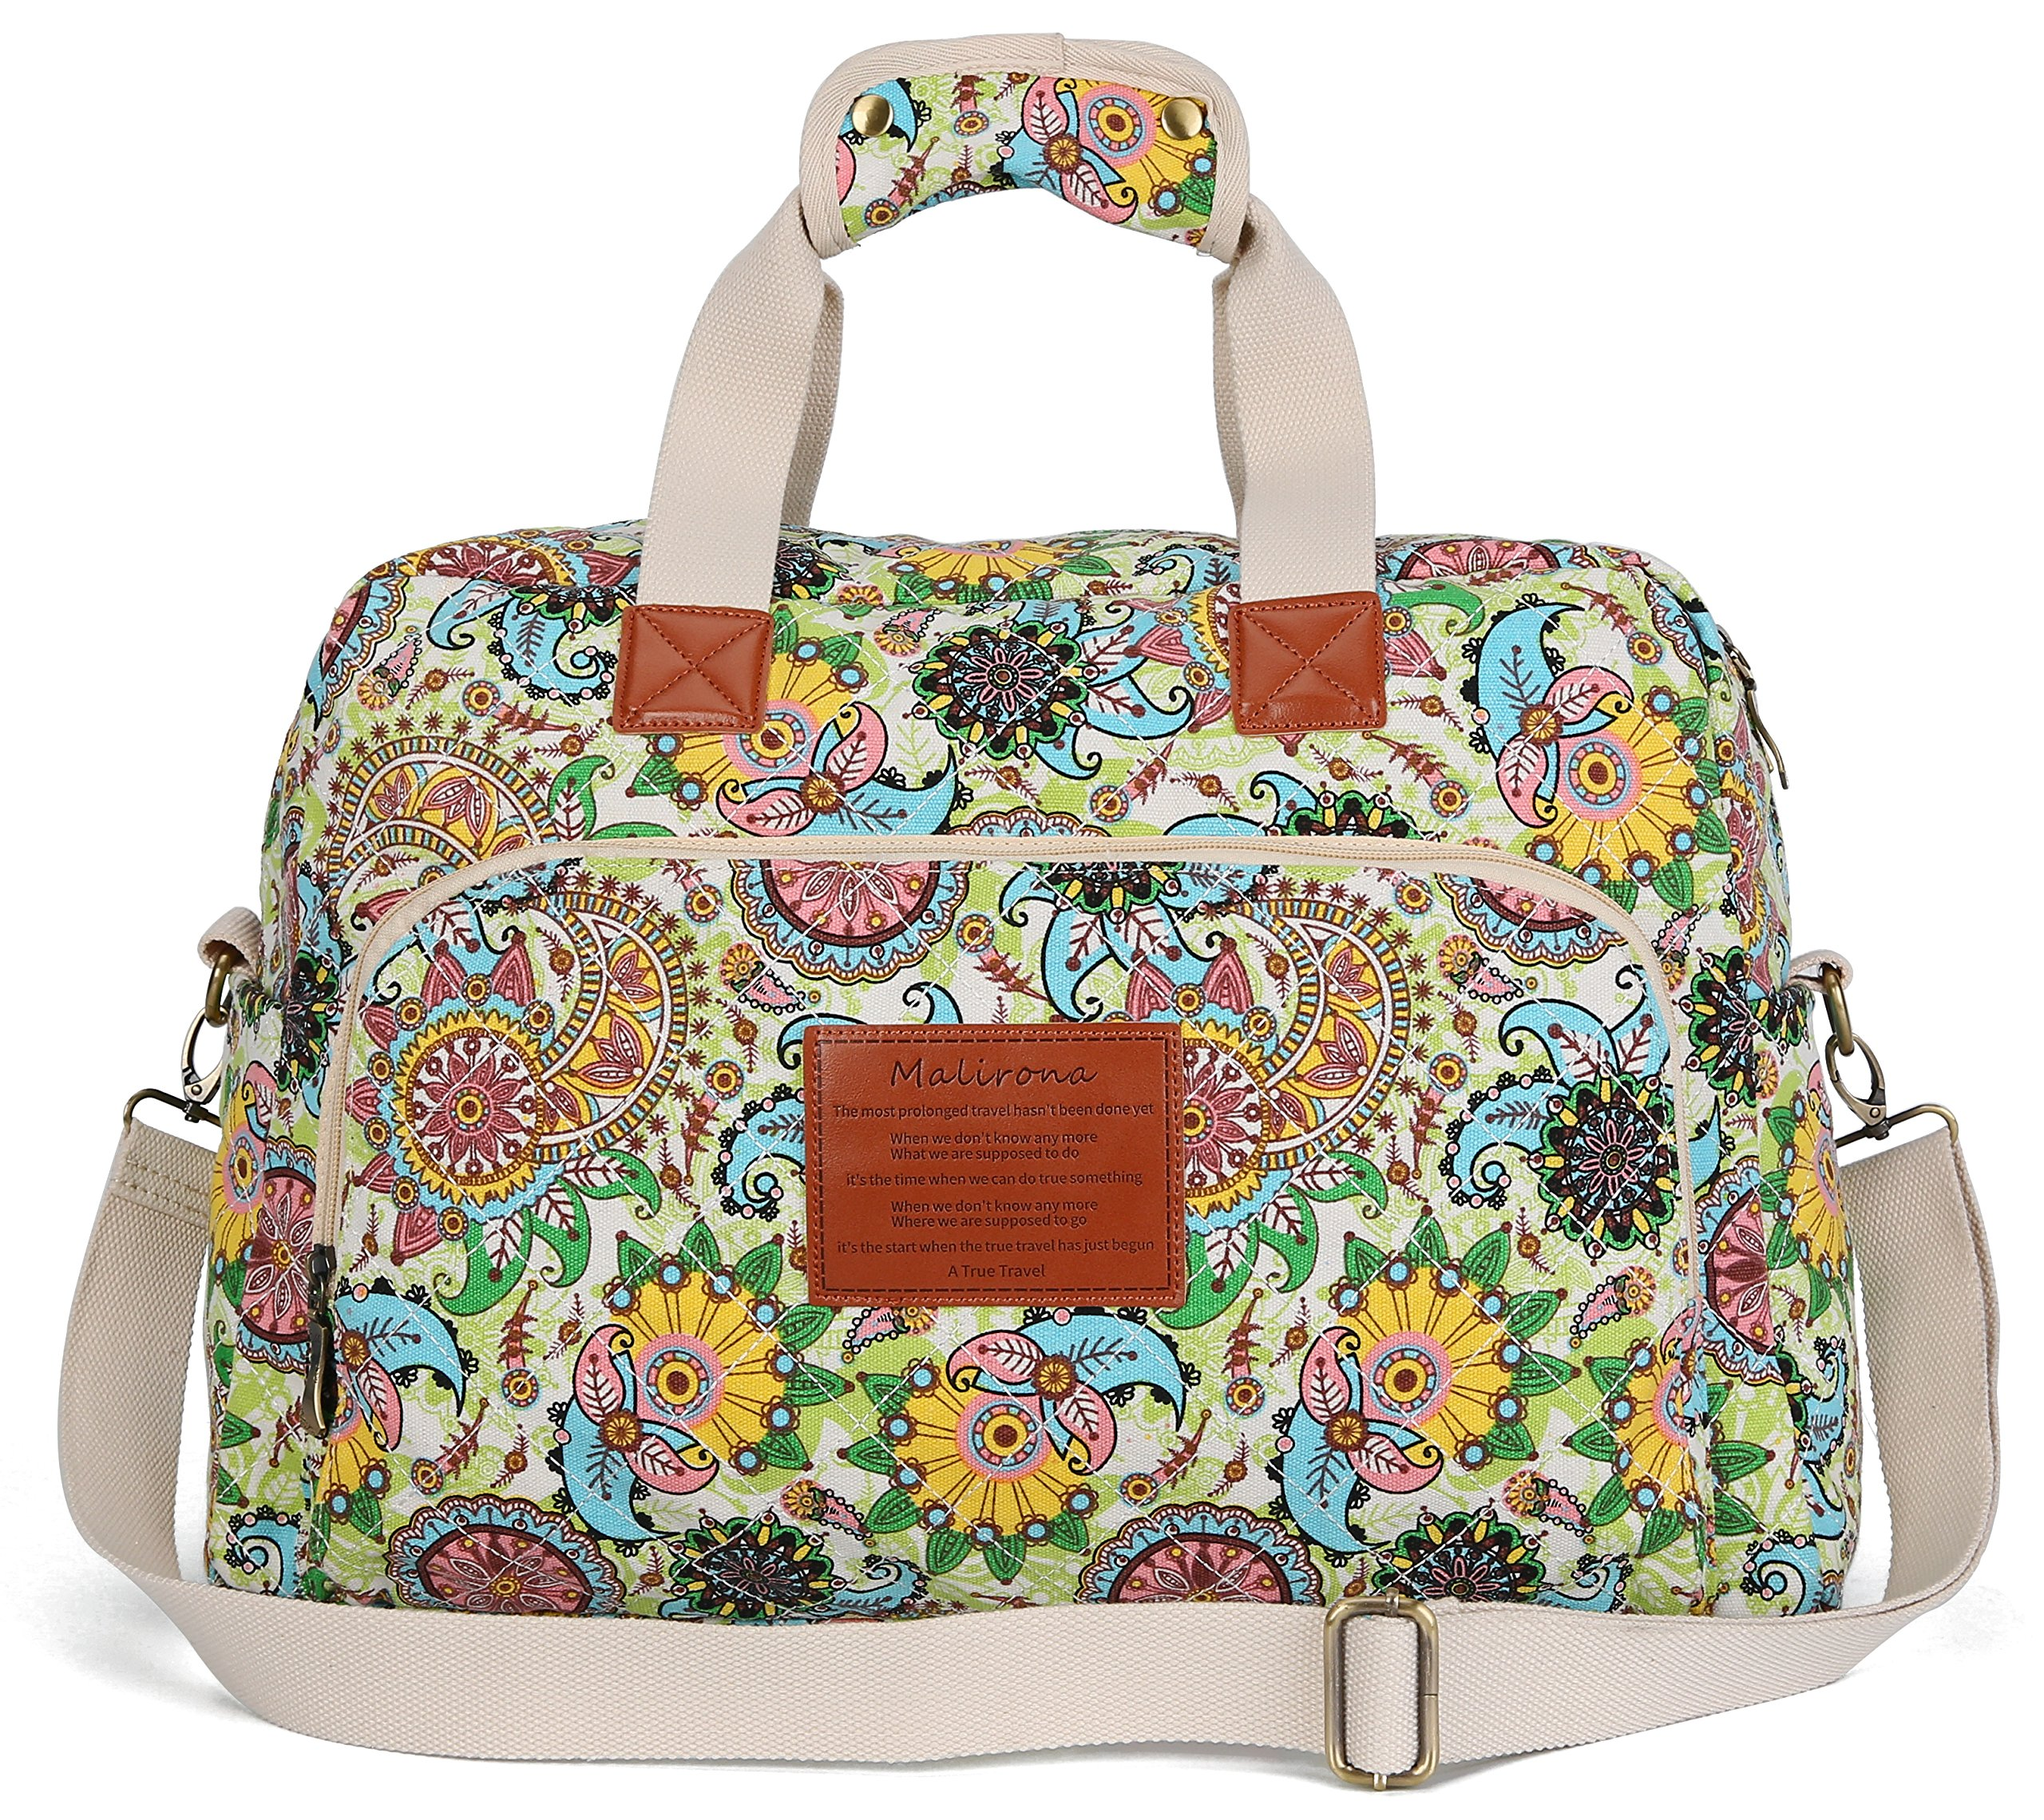 Malirona Canvas Overnight Bag Women Weekender Bag Carry On Travel Duffel Bag Floral Design (Flower) by Malirona (Image #1)